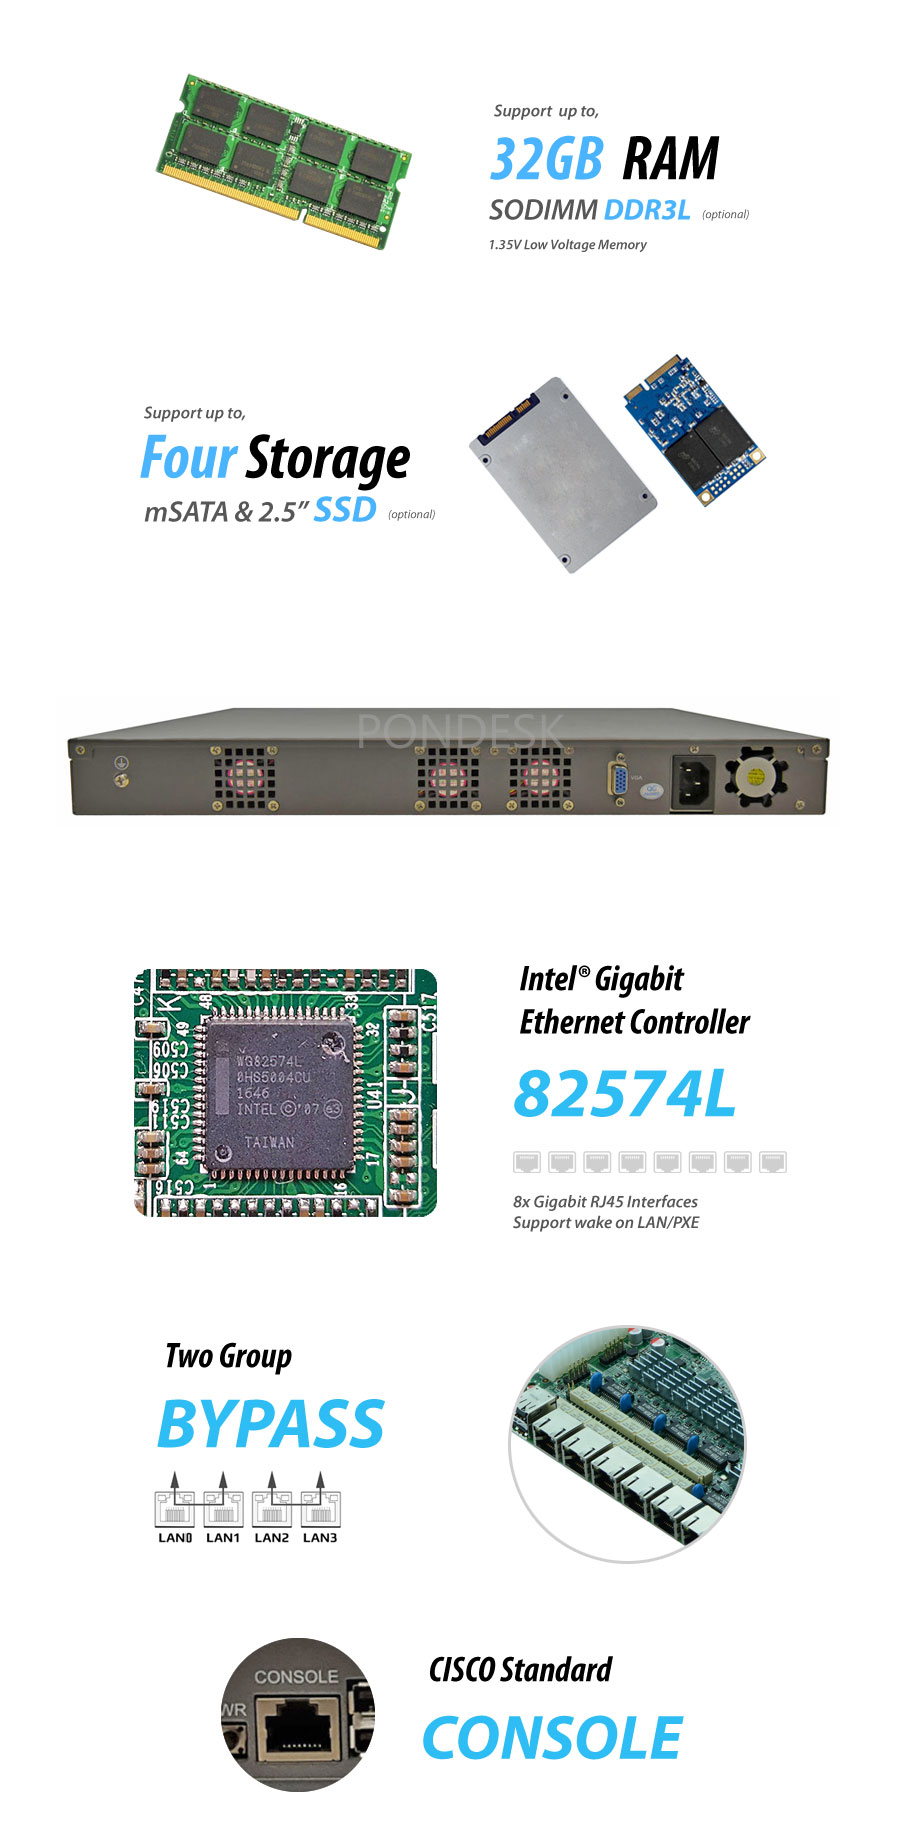 8 LAN 10Gig Fiber SFP+ 4G NGFW Firewall 1U Rackmount Server - NSHO-001 | Image